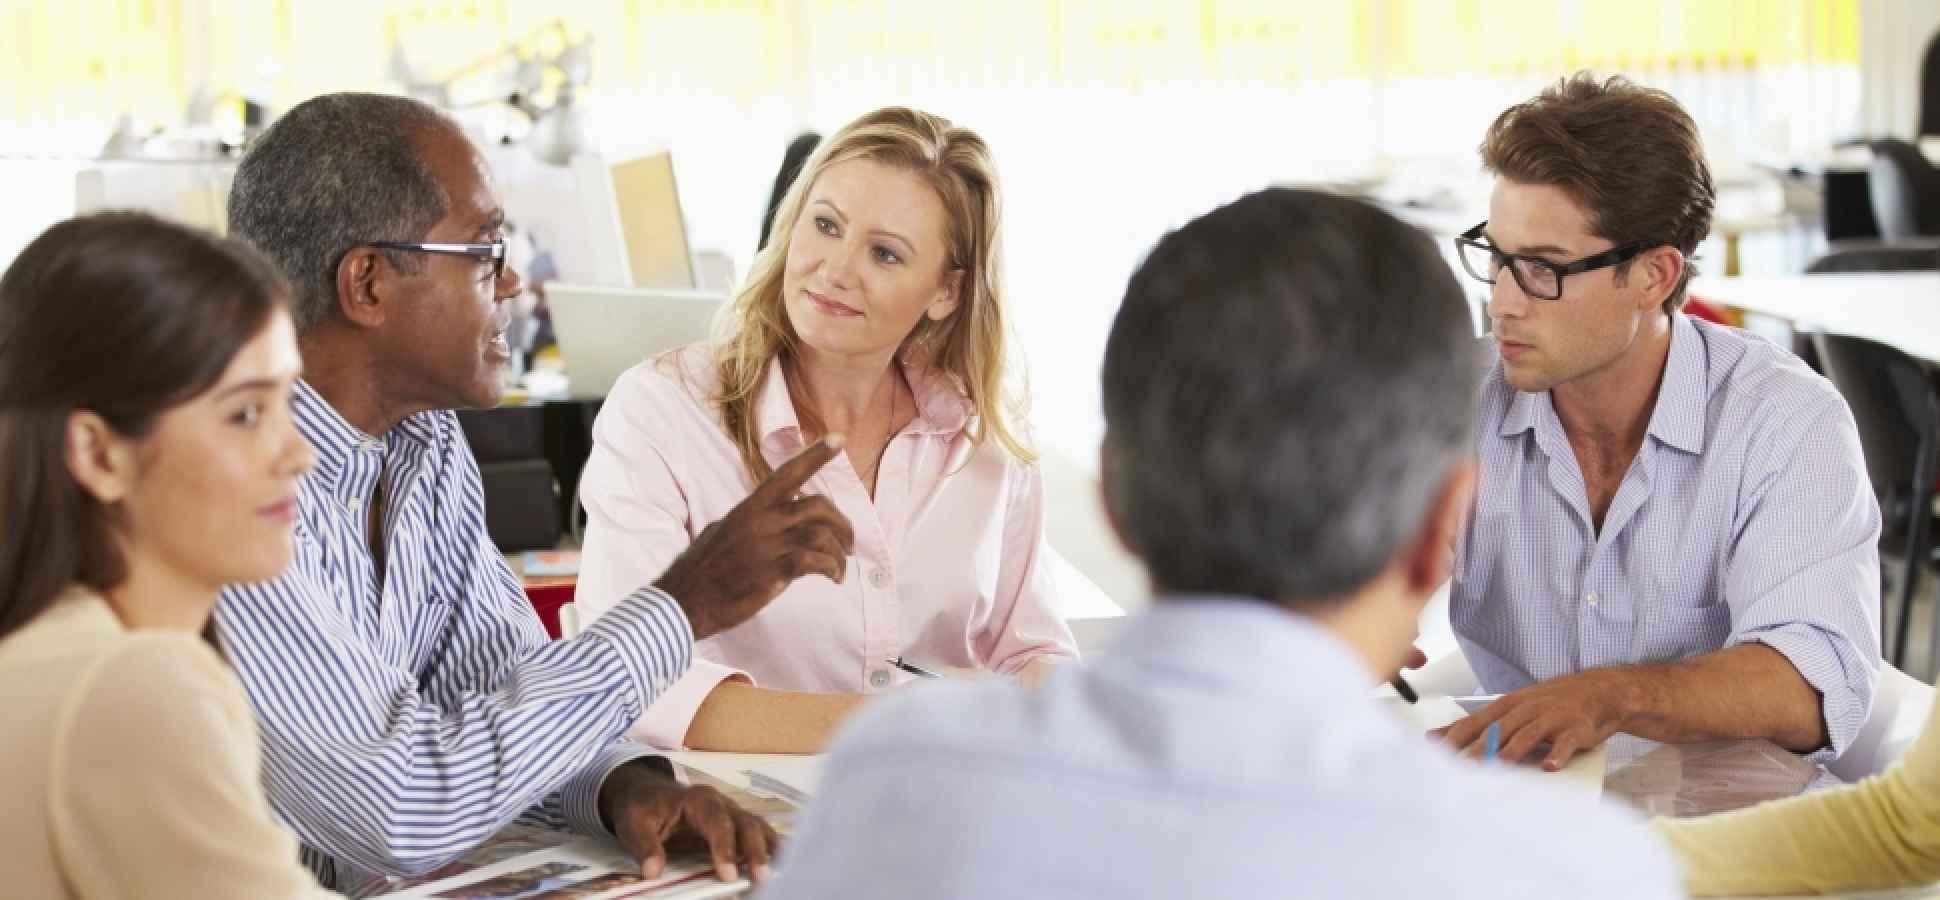 Management Communication 101: 5 Critical Ways to Build Rapport